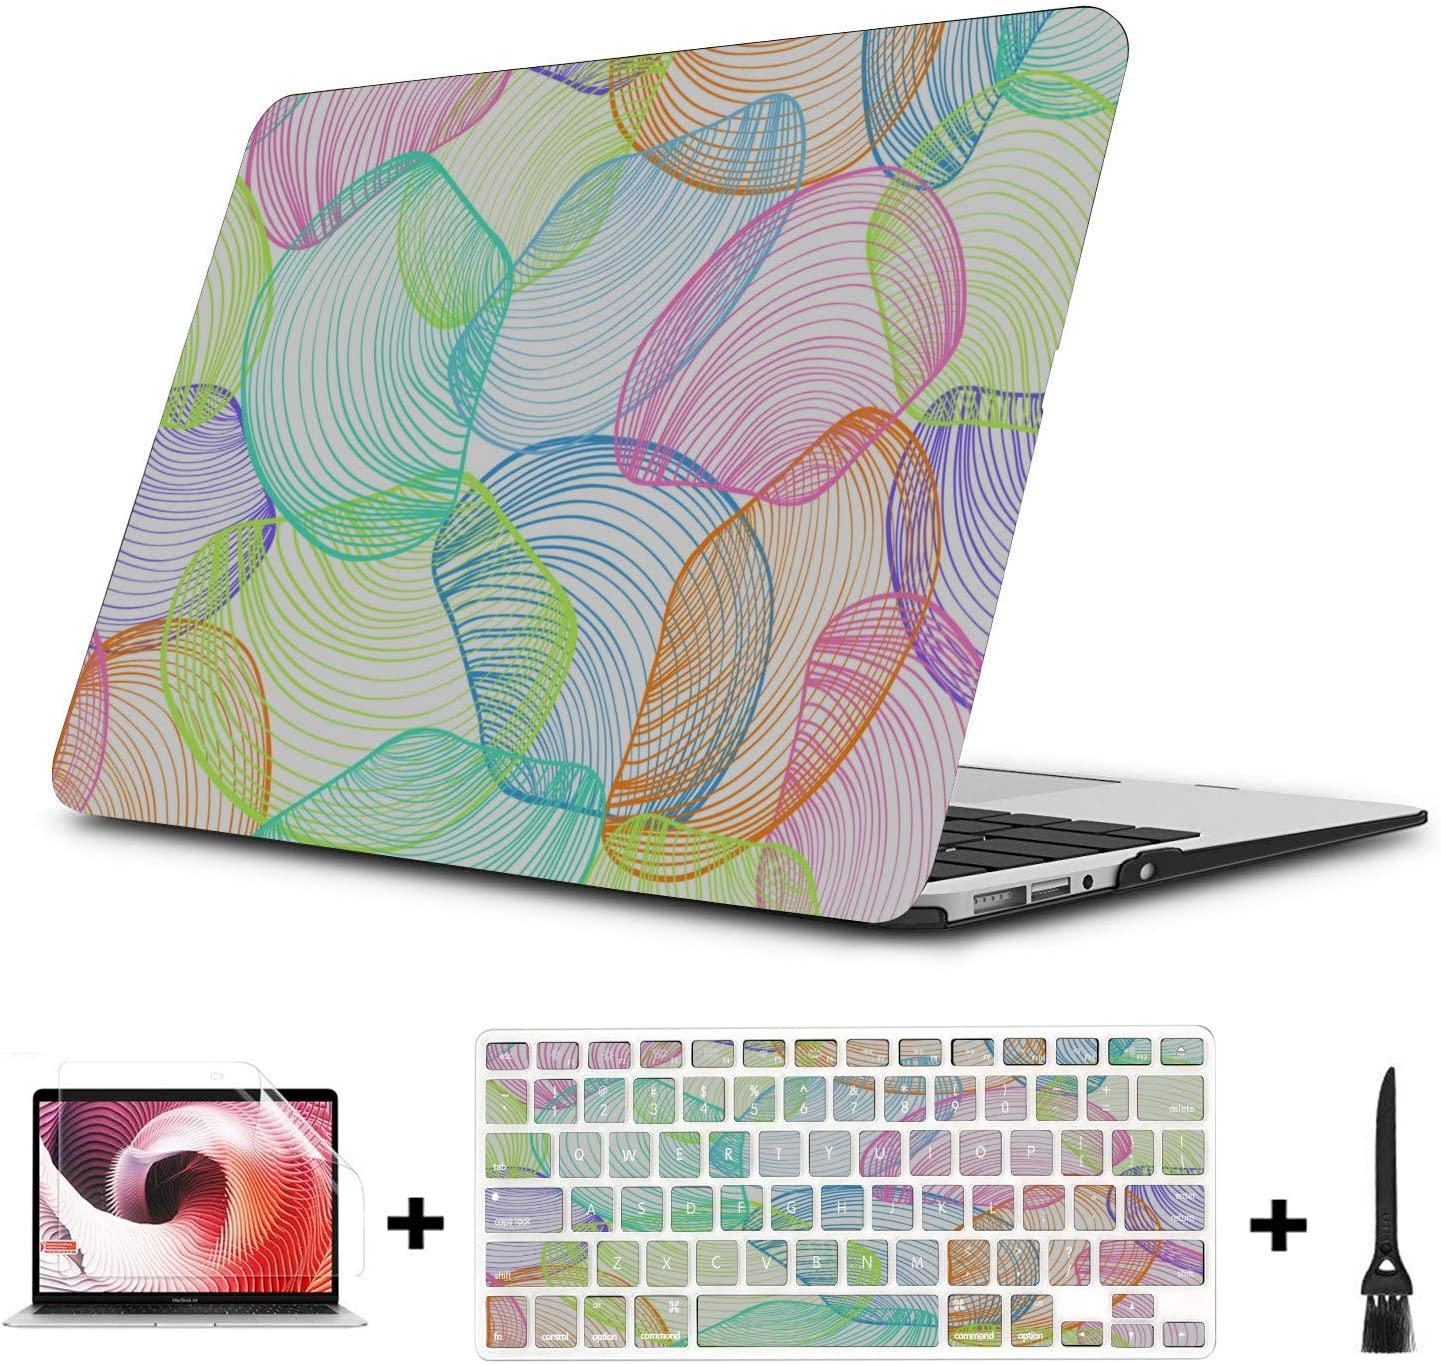 Macbookpro Case Summer Seaside Seashells Starfish Plastic Hard Shell Compatible Mac Air 11 Pro 13 15 MacBook Pro A1989 Case Protection for MacBook 2016-2019 Version